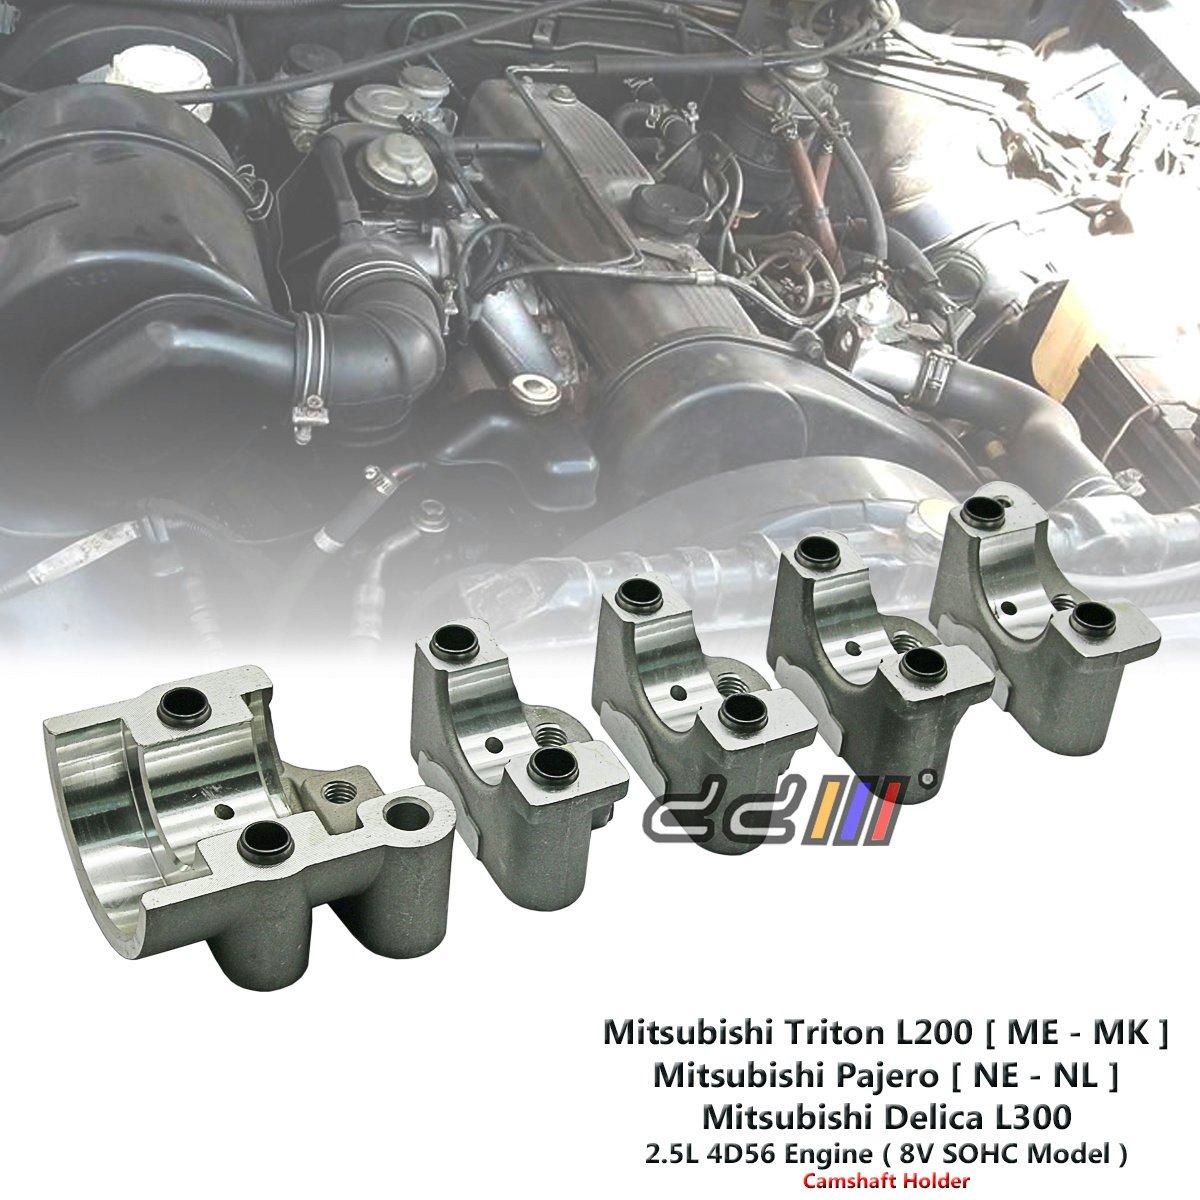 1 Set Camshaft Holder For Mitsubishi Triton MG MH MJ MK 2.5L 4D56 SOHC 1986-05